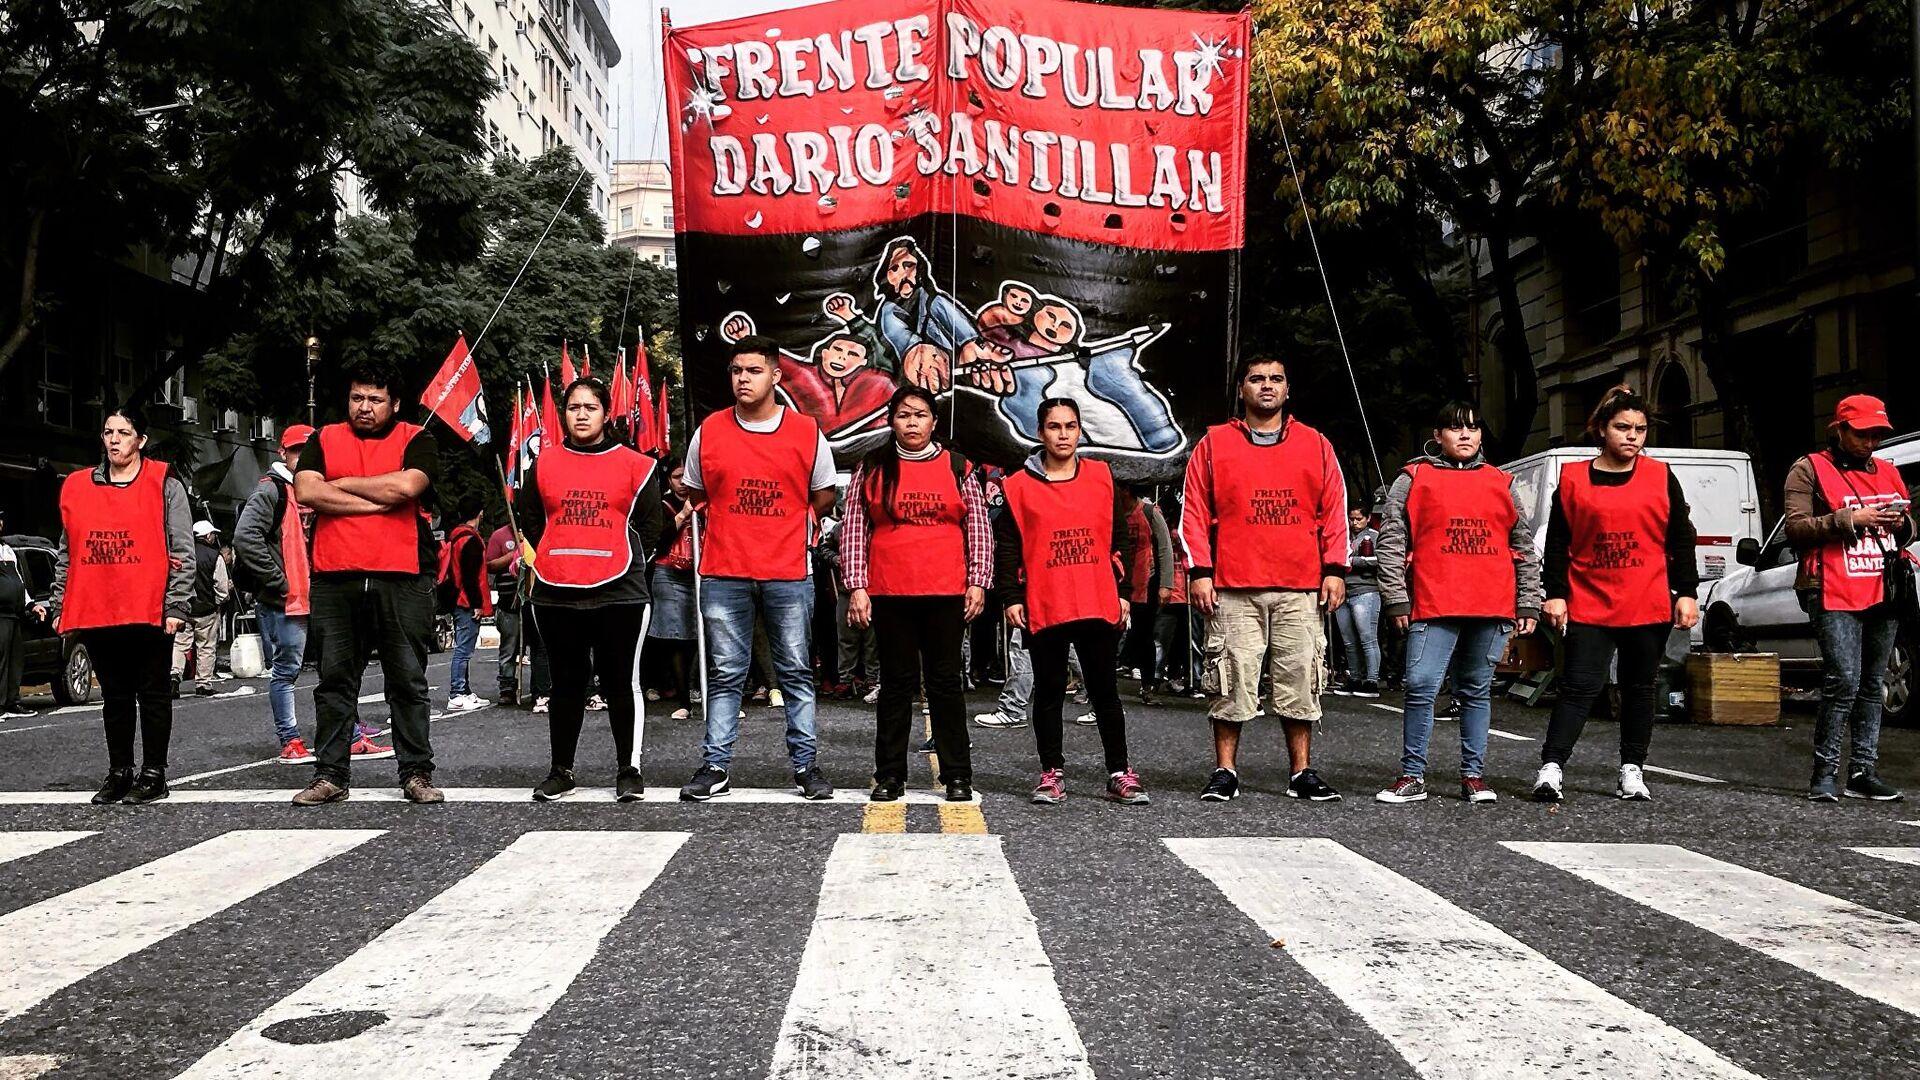 Militantes del Frente Popular Darío Santillán (Argentina) - Sputnik Mundo, 1920, 20.05.2021